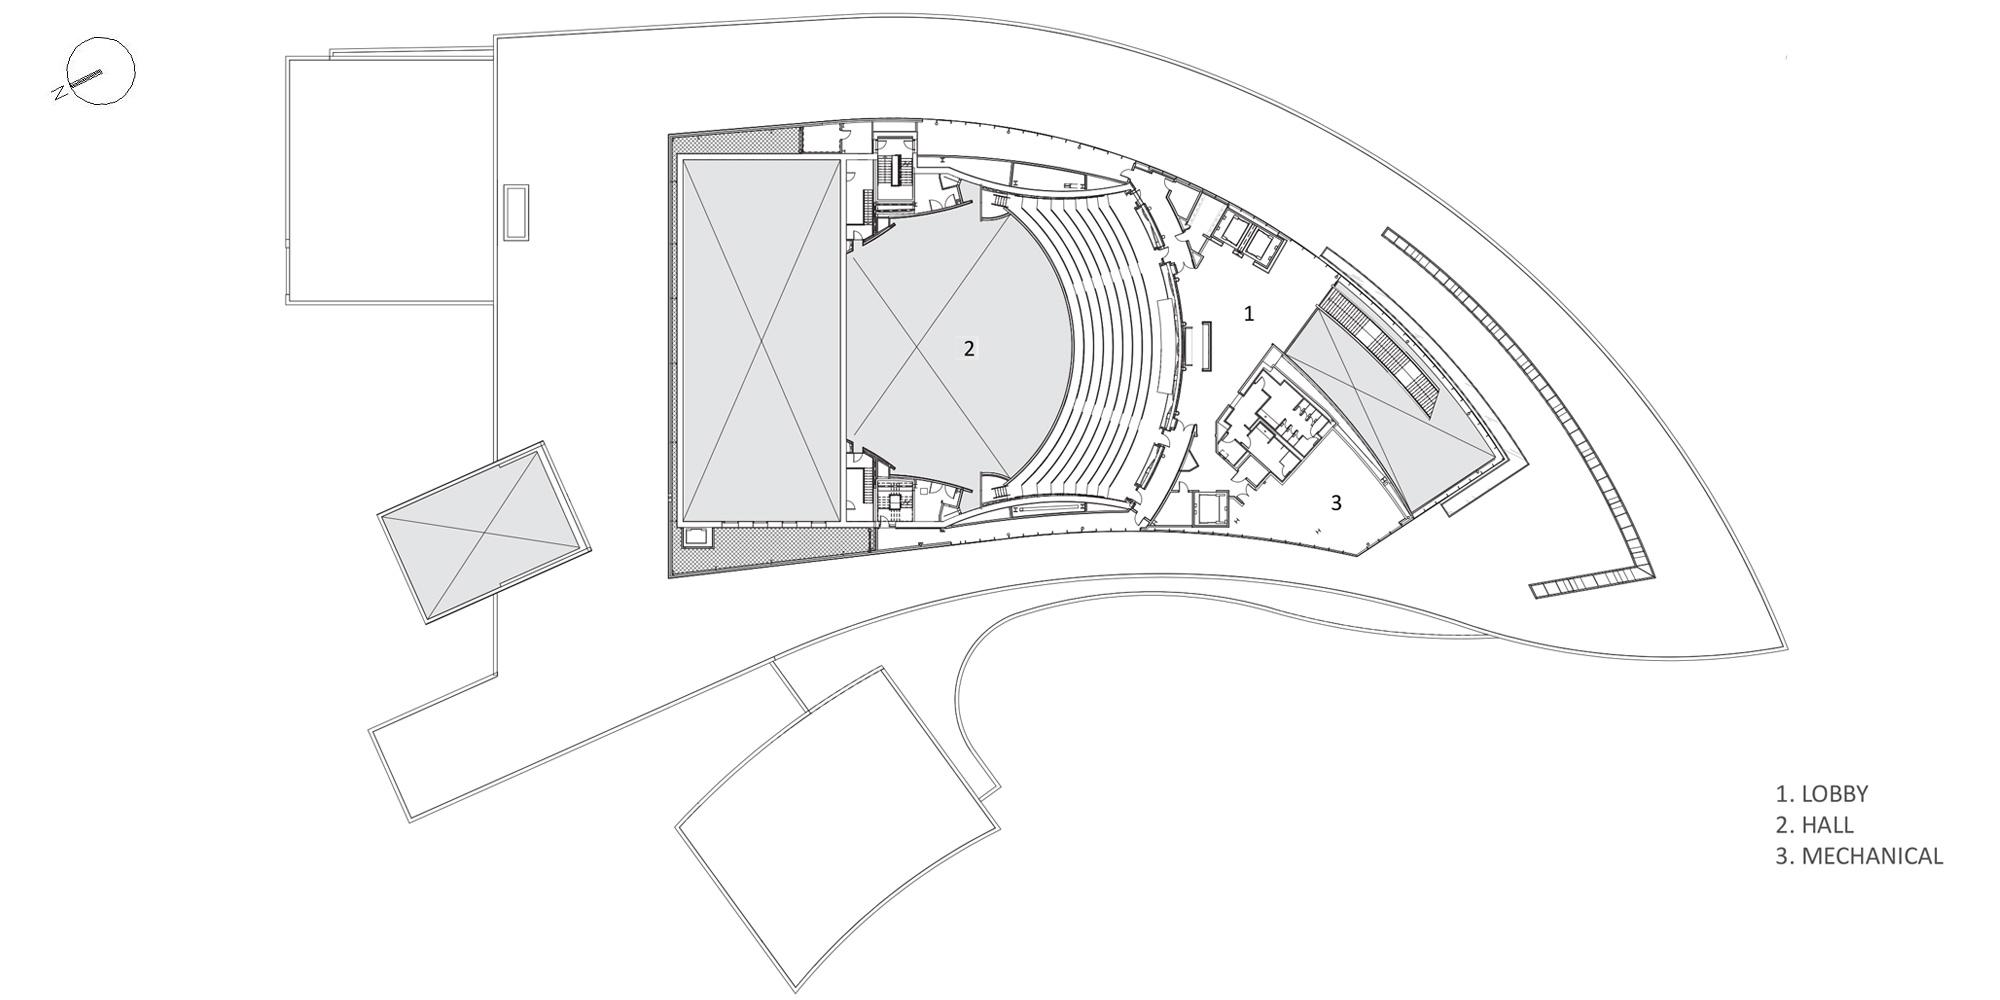 Level 3 Plan © Pelli Clarke Pelli Architects